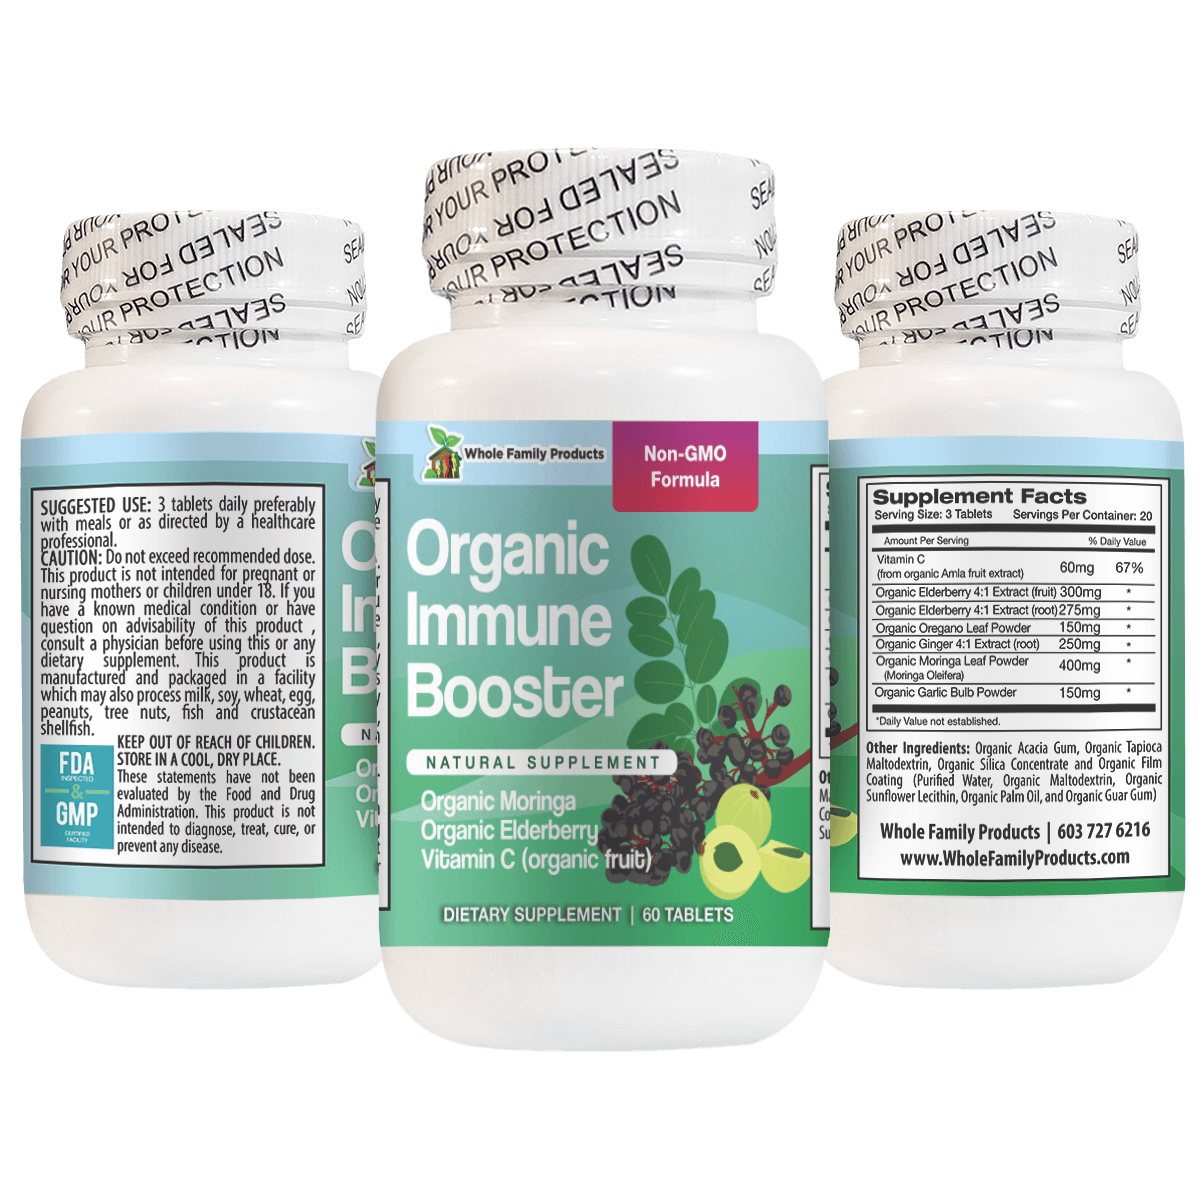 Organic Immune System Booster with Vitamin C, Organic Moringa and Elderberry